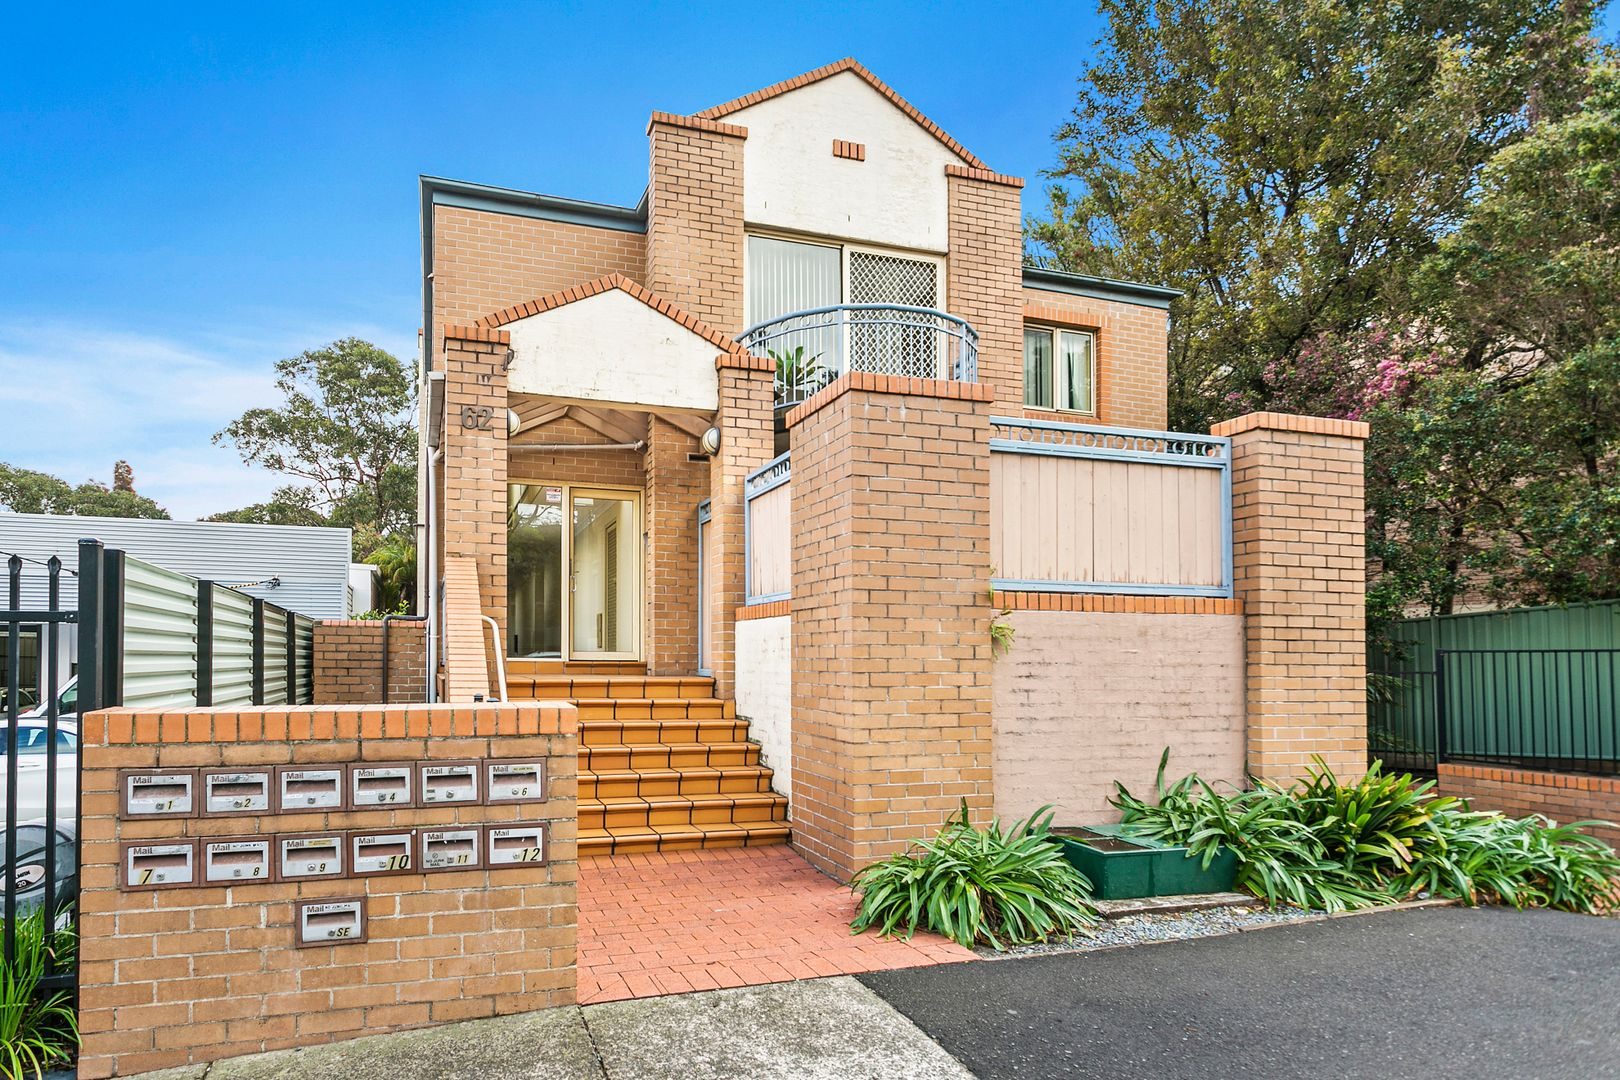 12/62 Bourke Street, North Wollongong NSW 2500, Image 0